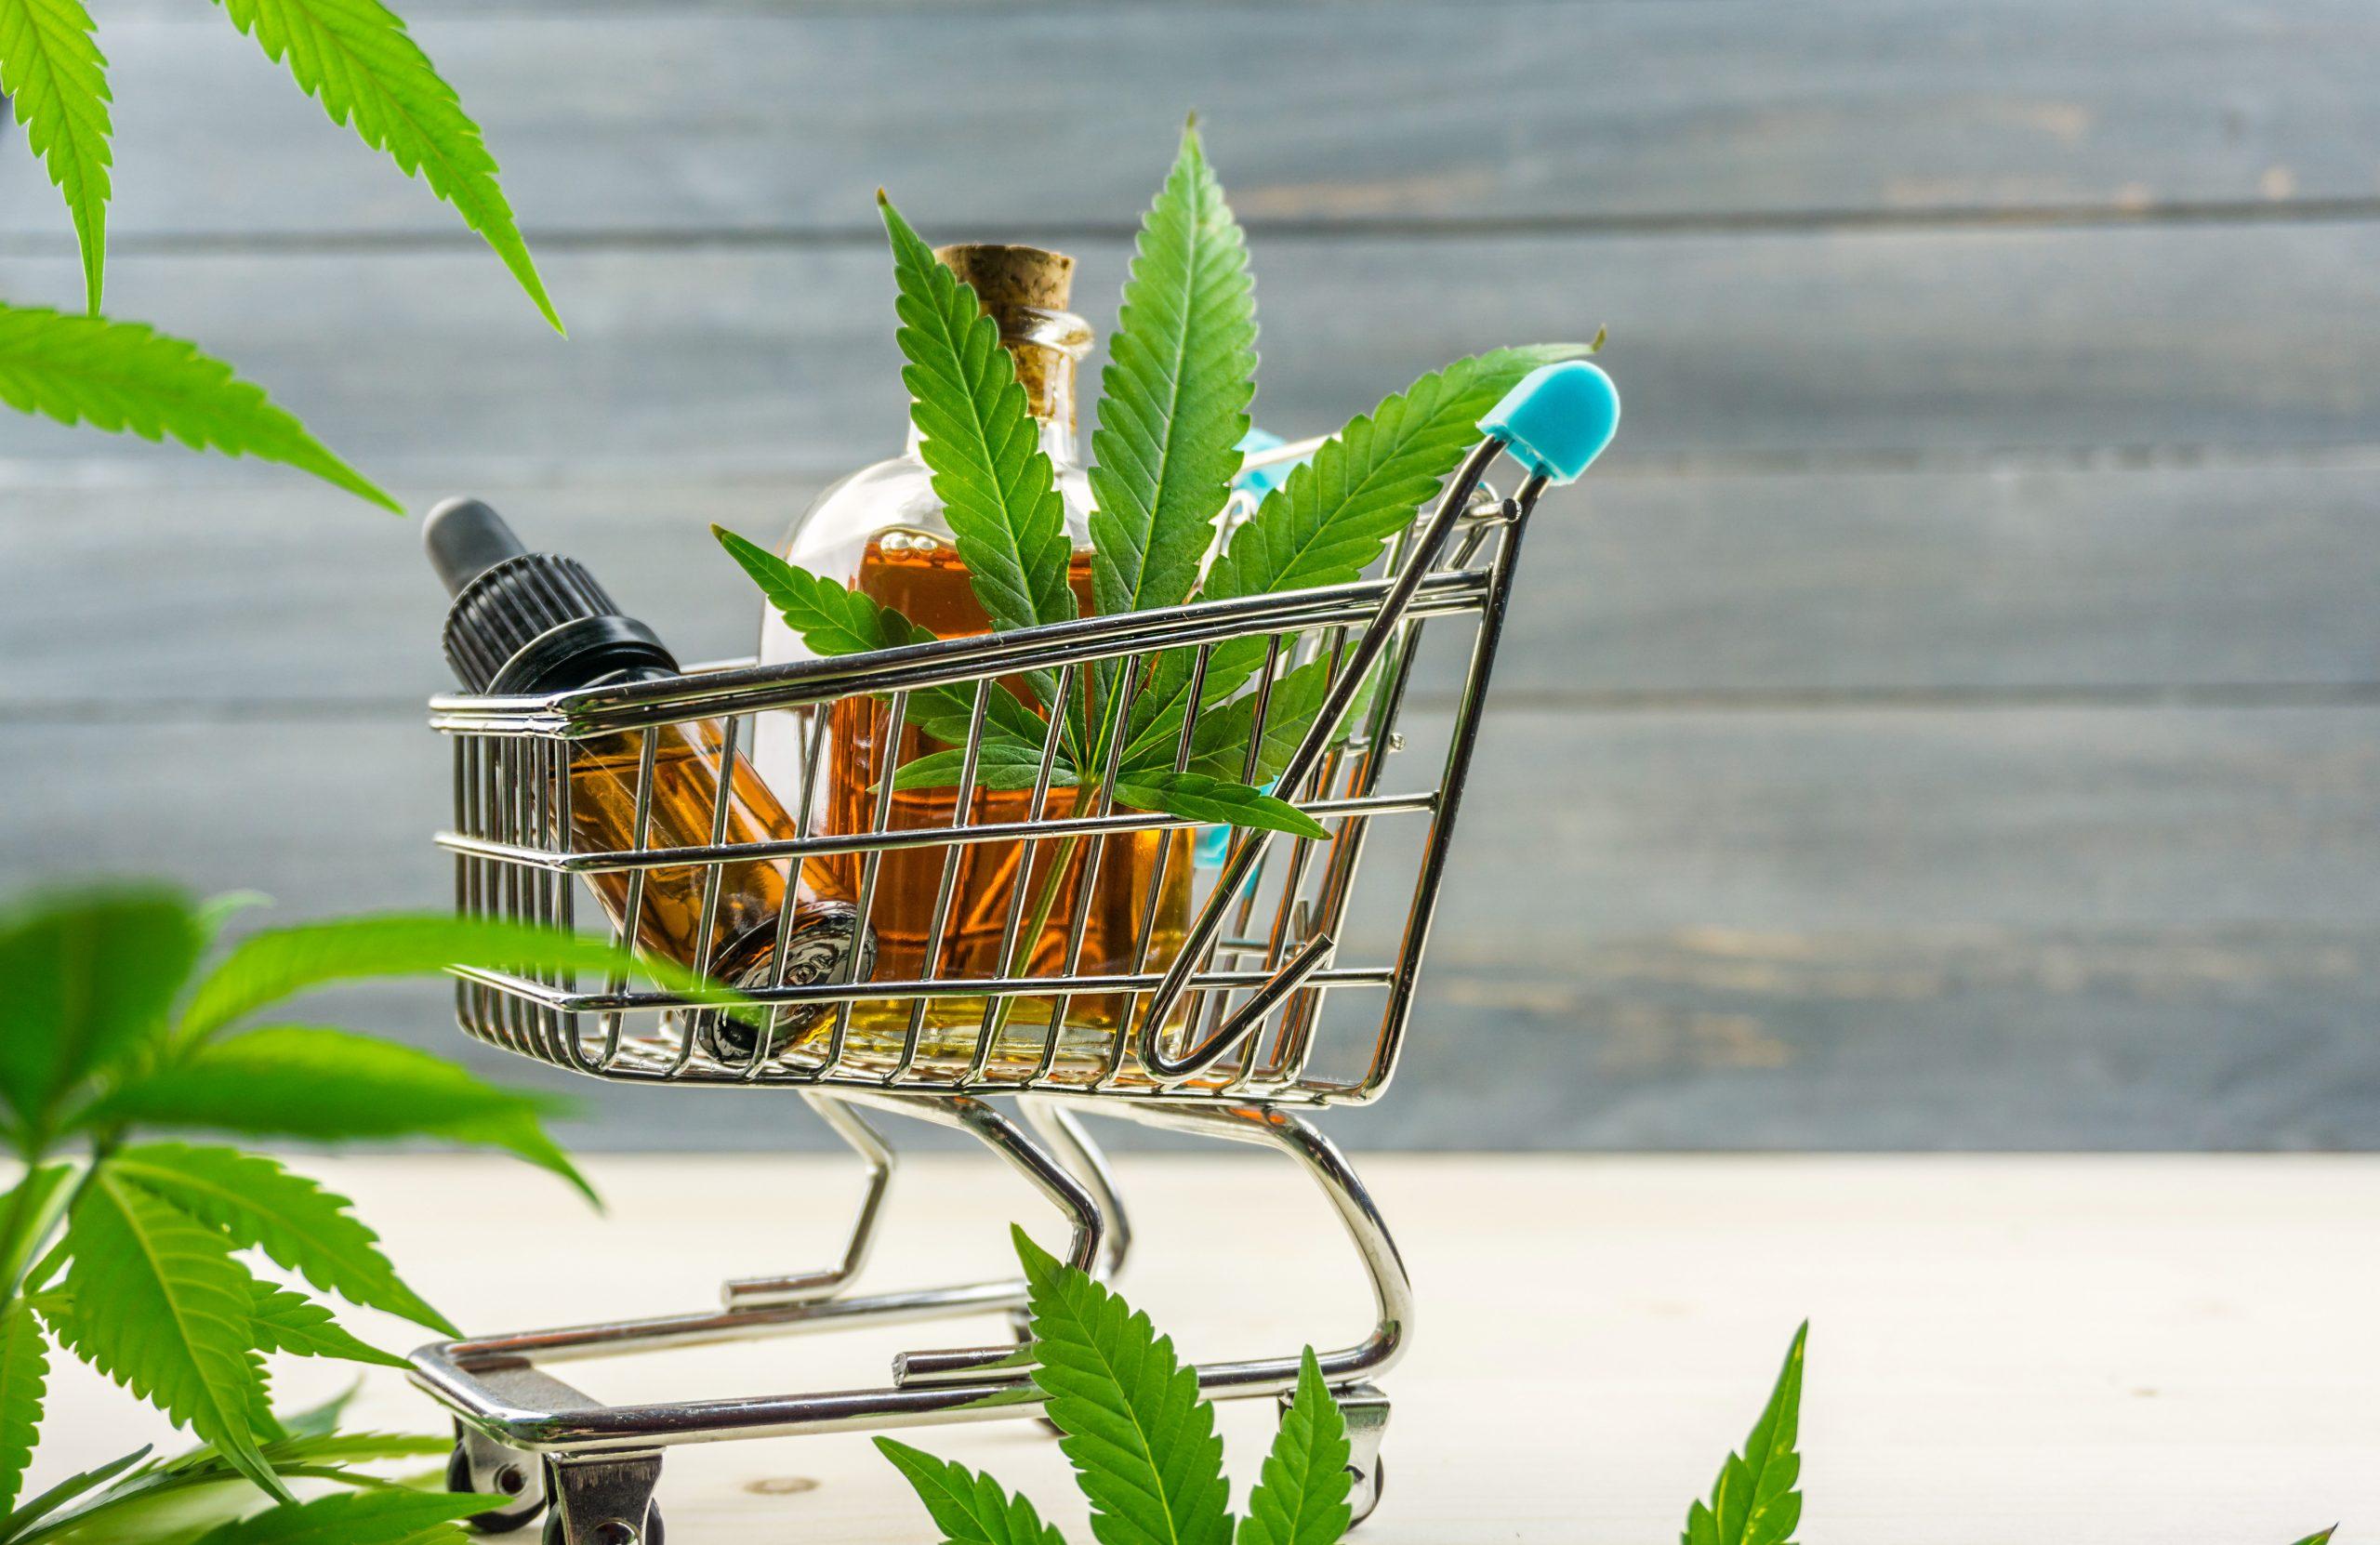 Nielsen predicts Amazon entry into U.S. CBD retail at MJBizCon hemp forum